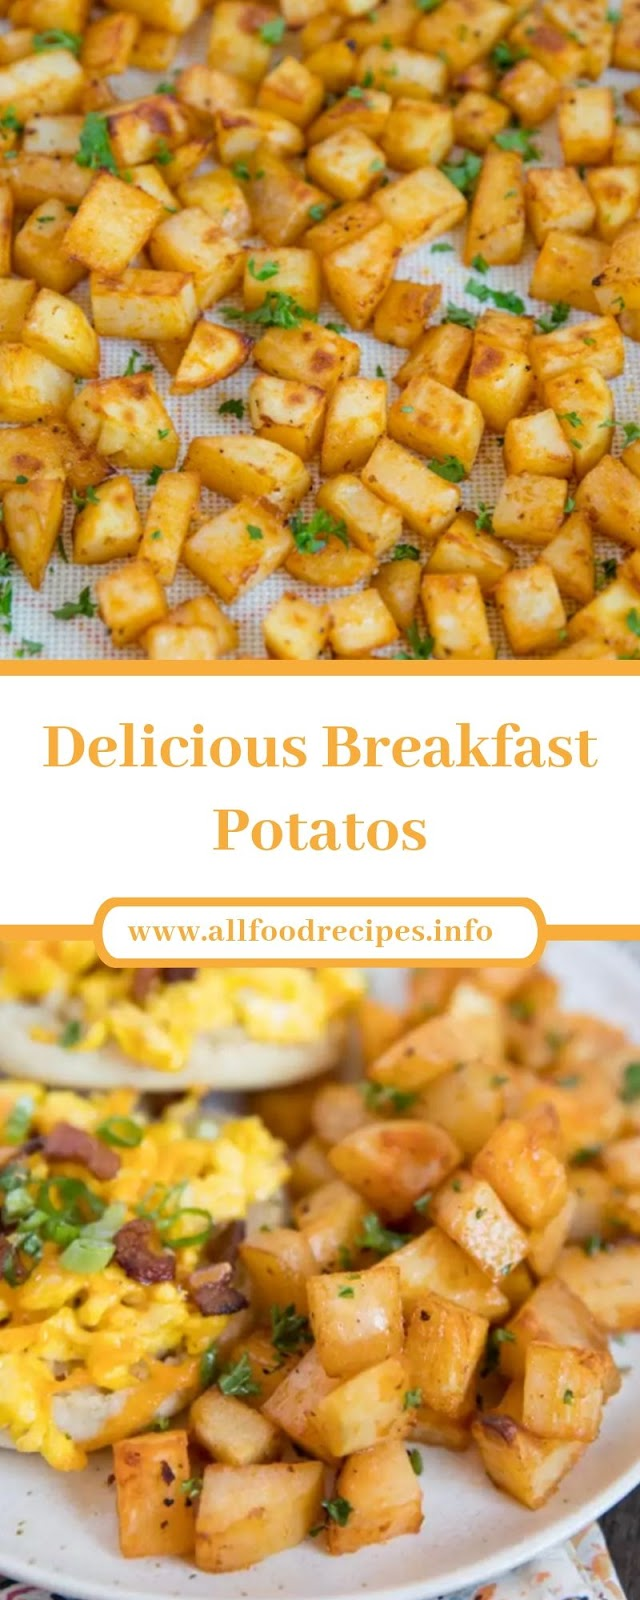 Delicious Breakfast Potatos